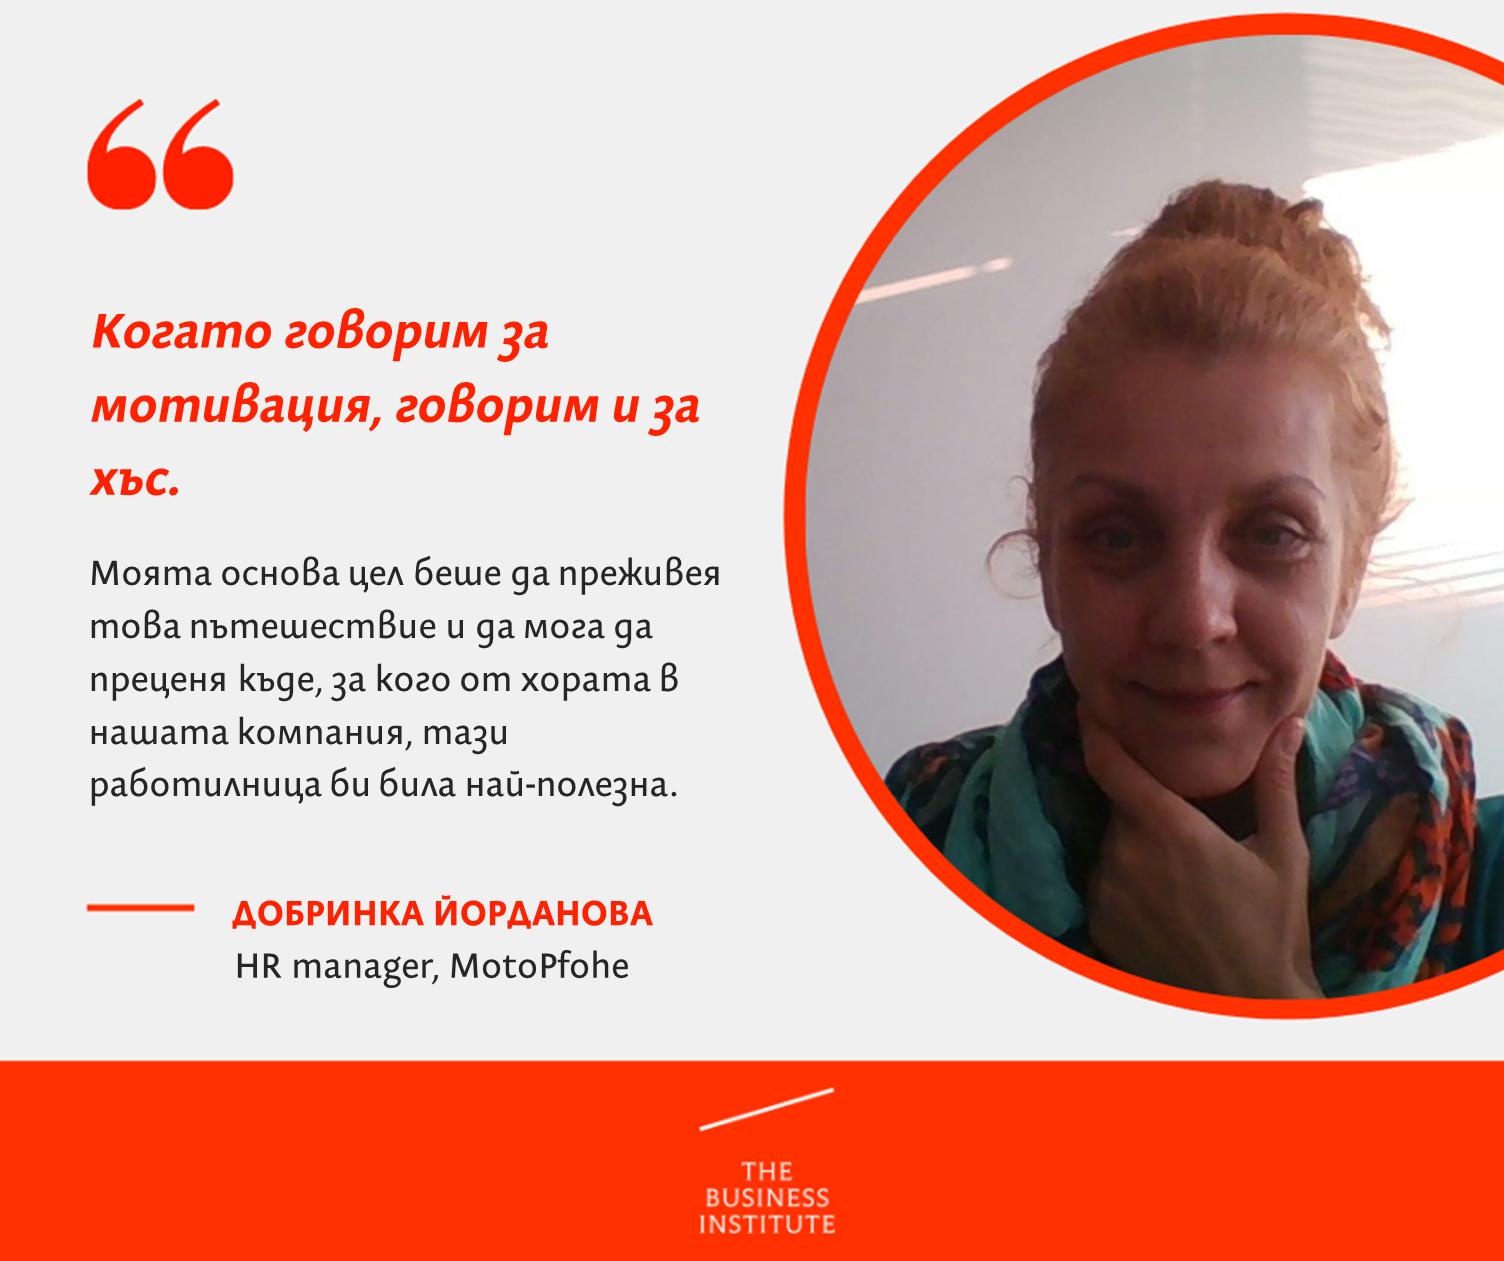 Dobrinka Jordanova Interview pic